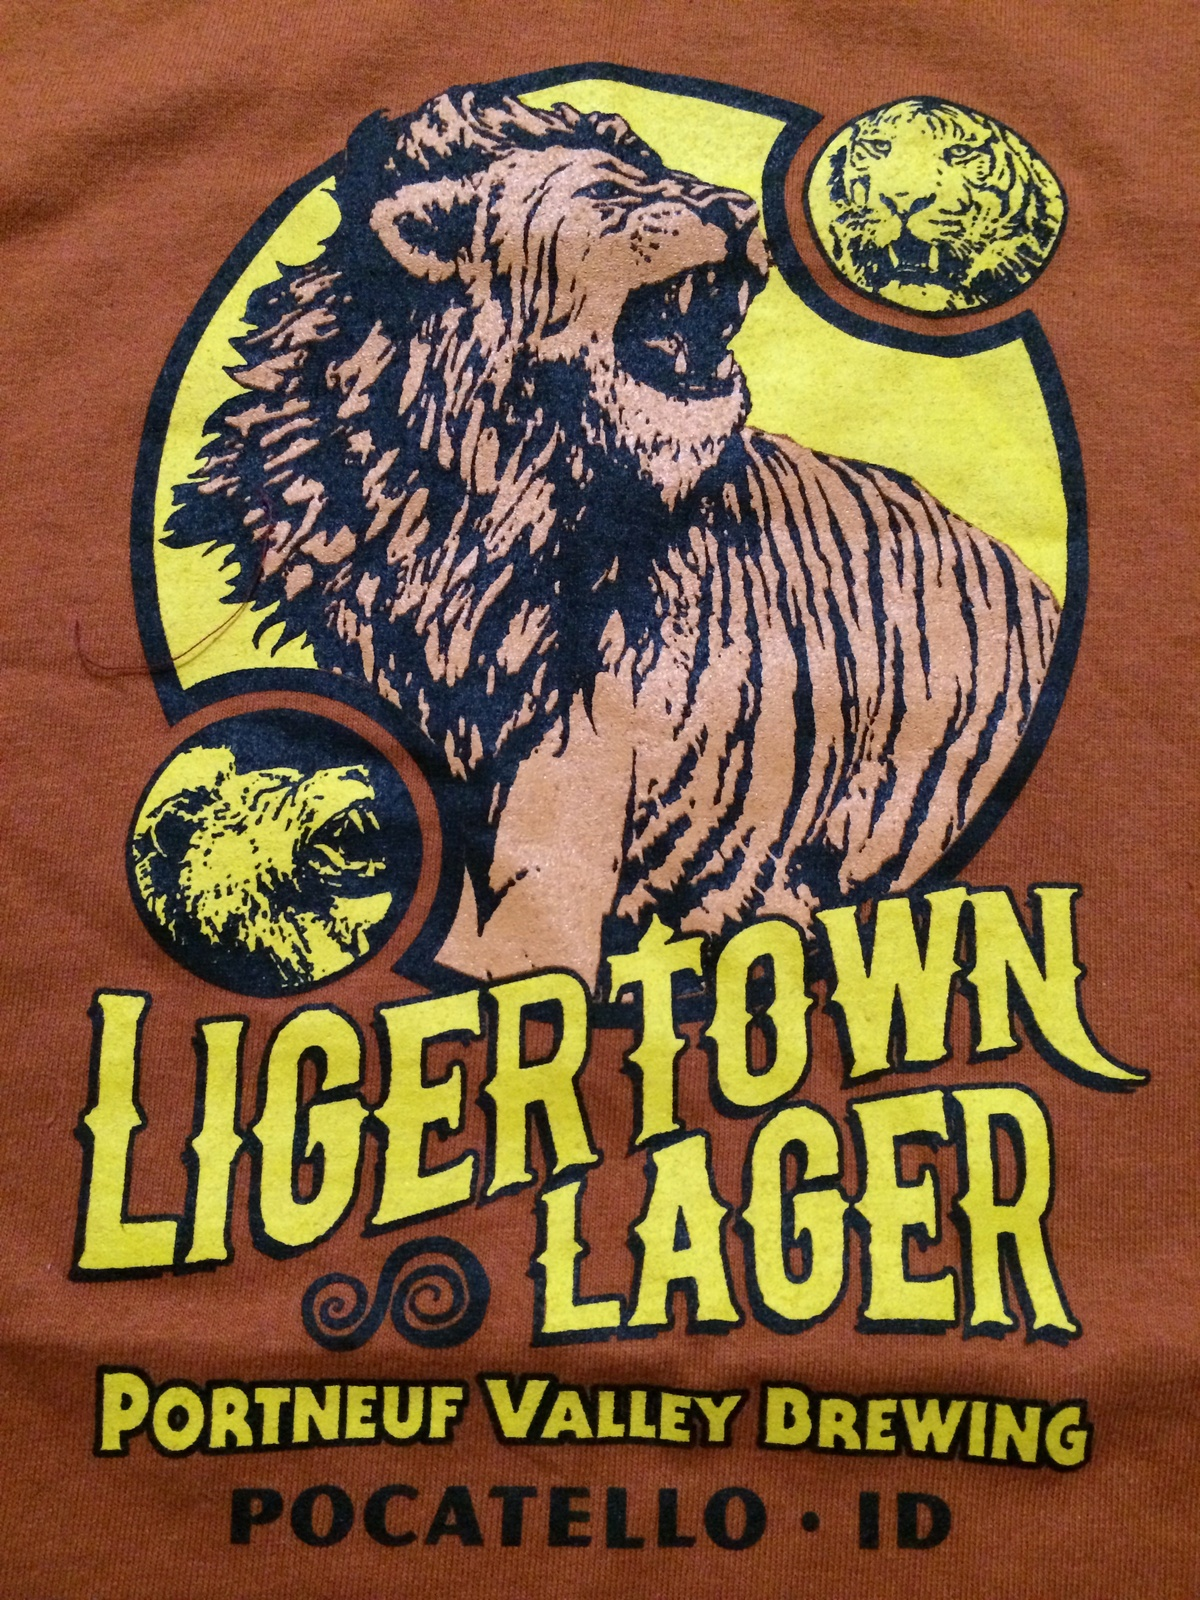 Ligertown Lager Cool Portneuf Valley Brewing Pocatello, Idaho T-Shirt Sz Medium